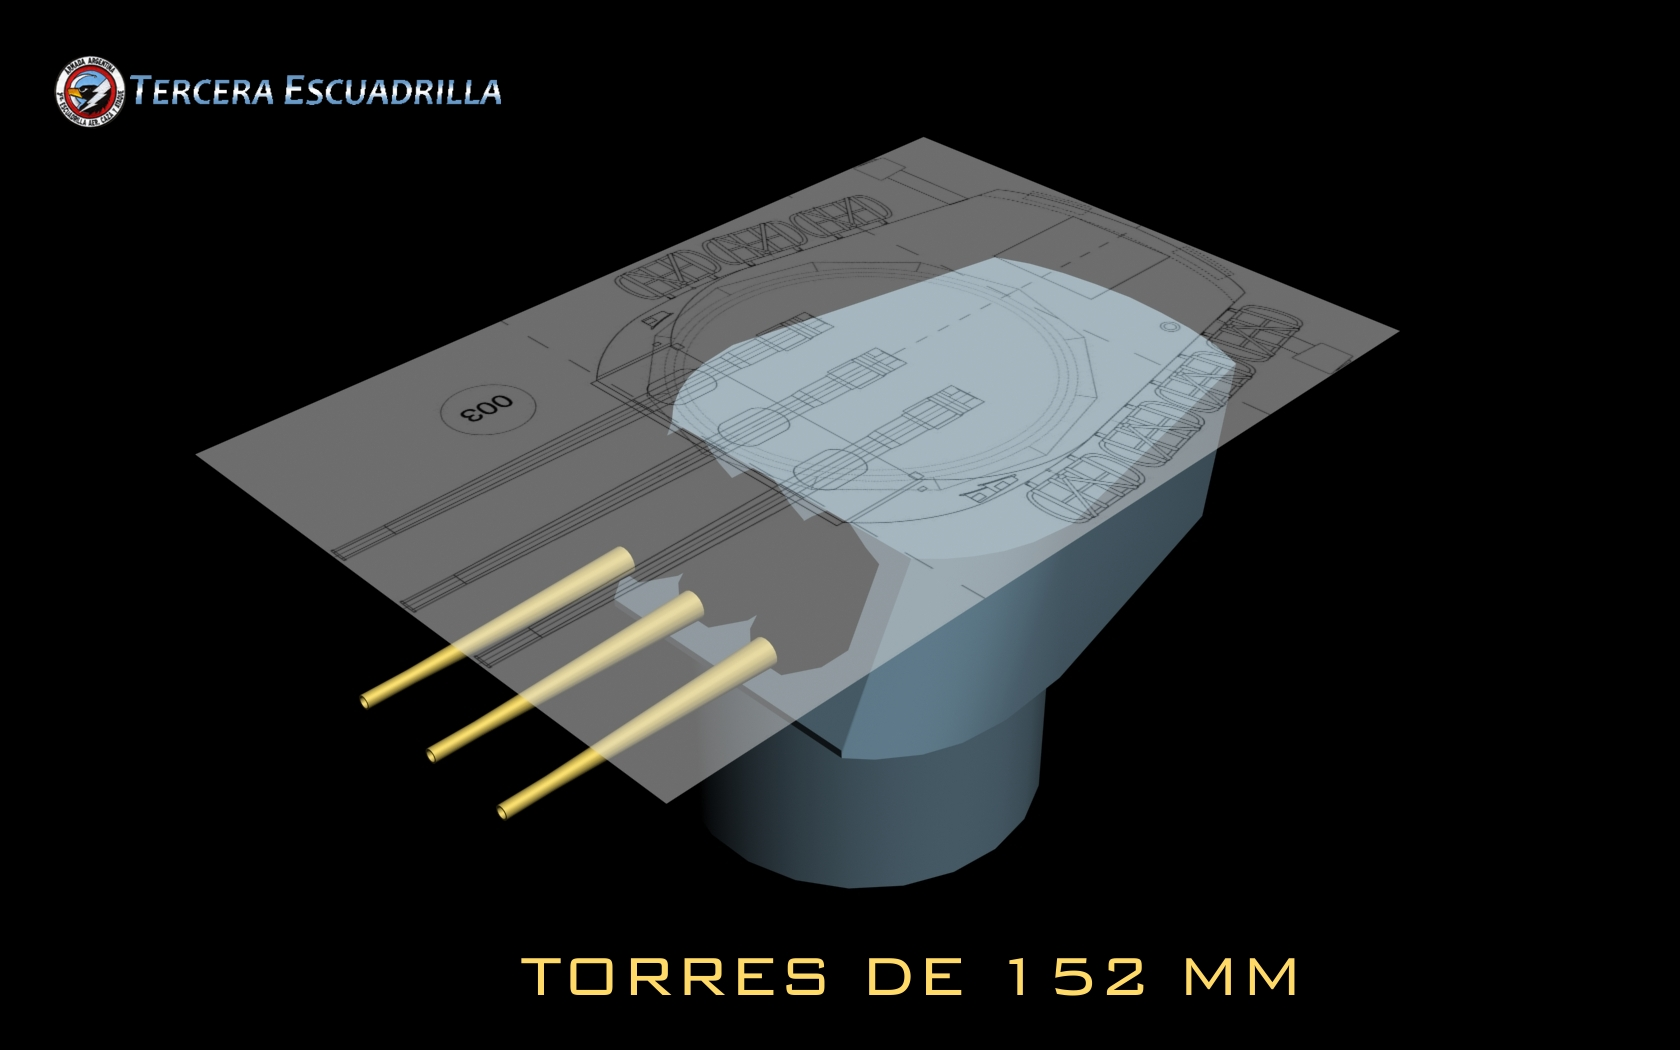 ARA_General_Belgrano_2.jpg